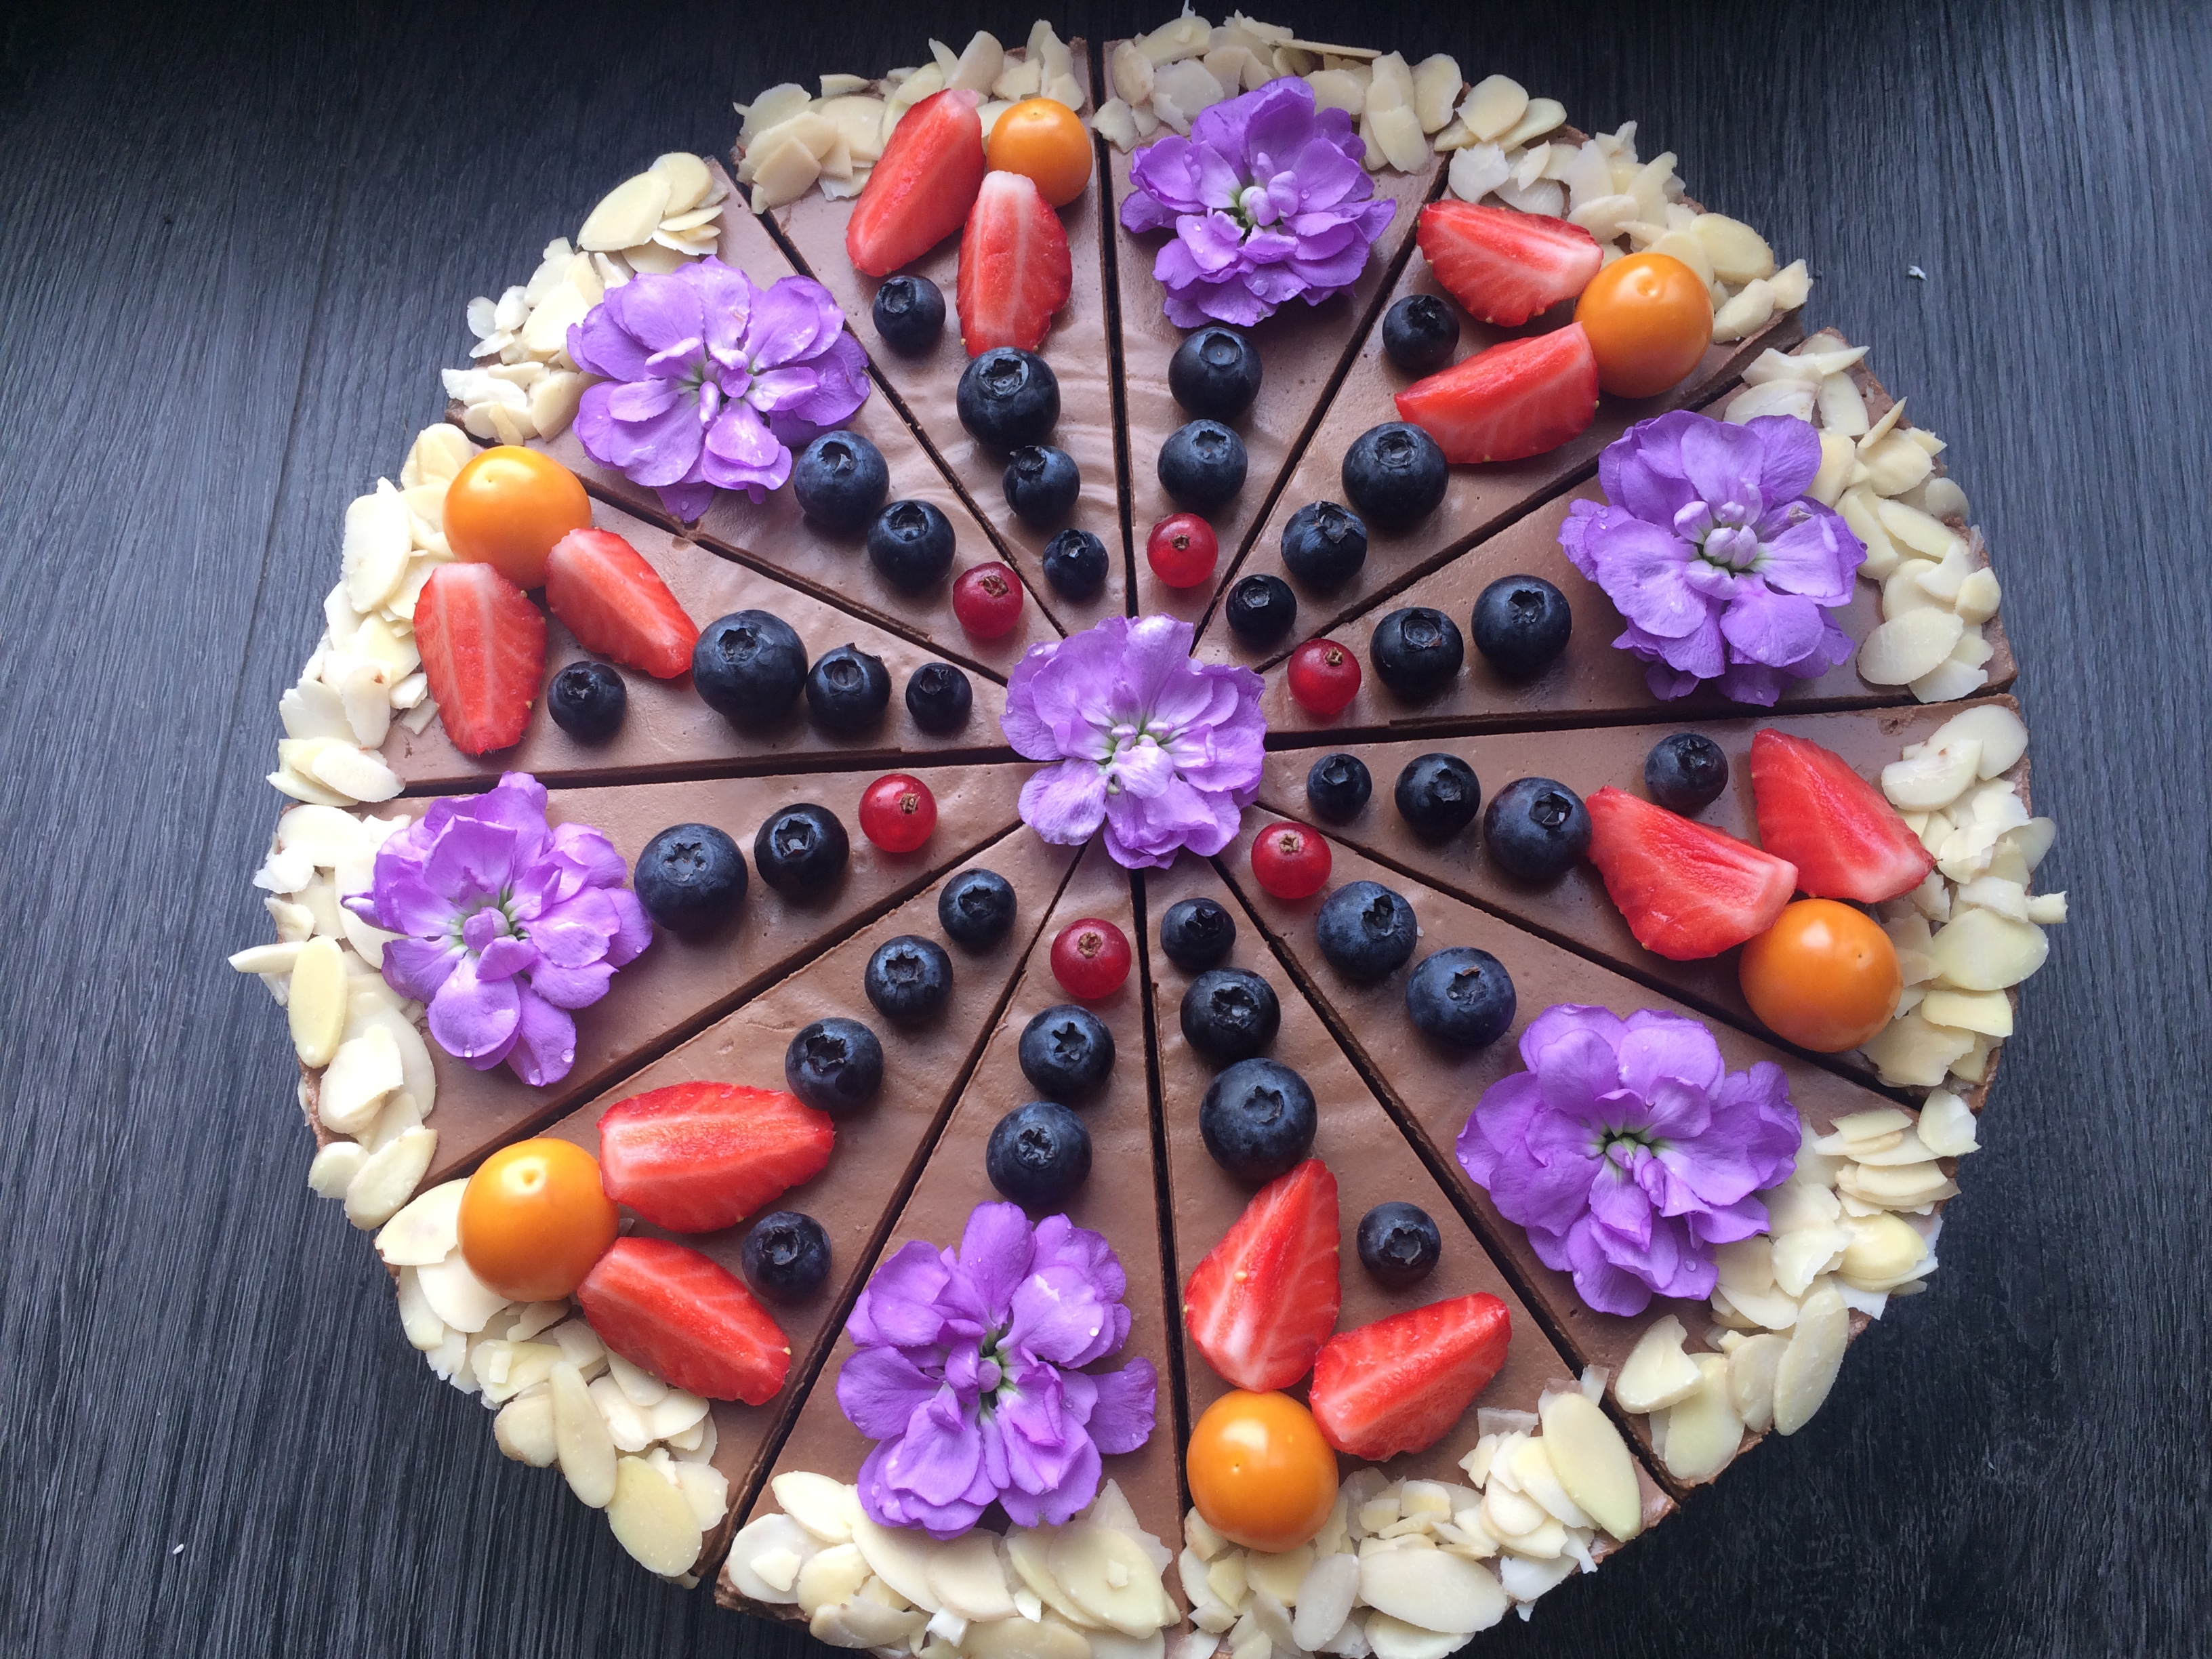 Čokoládová raw torta s ovocím a jedlými kvietkami